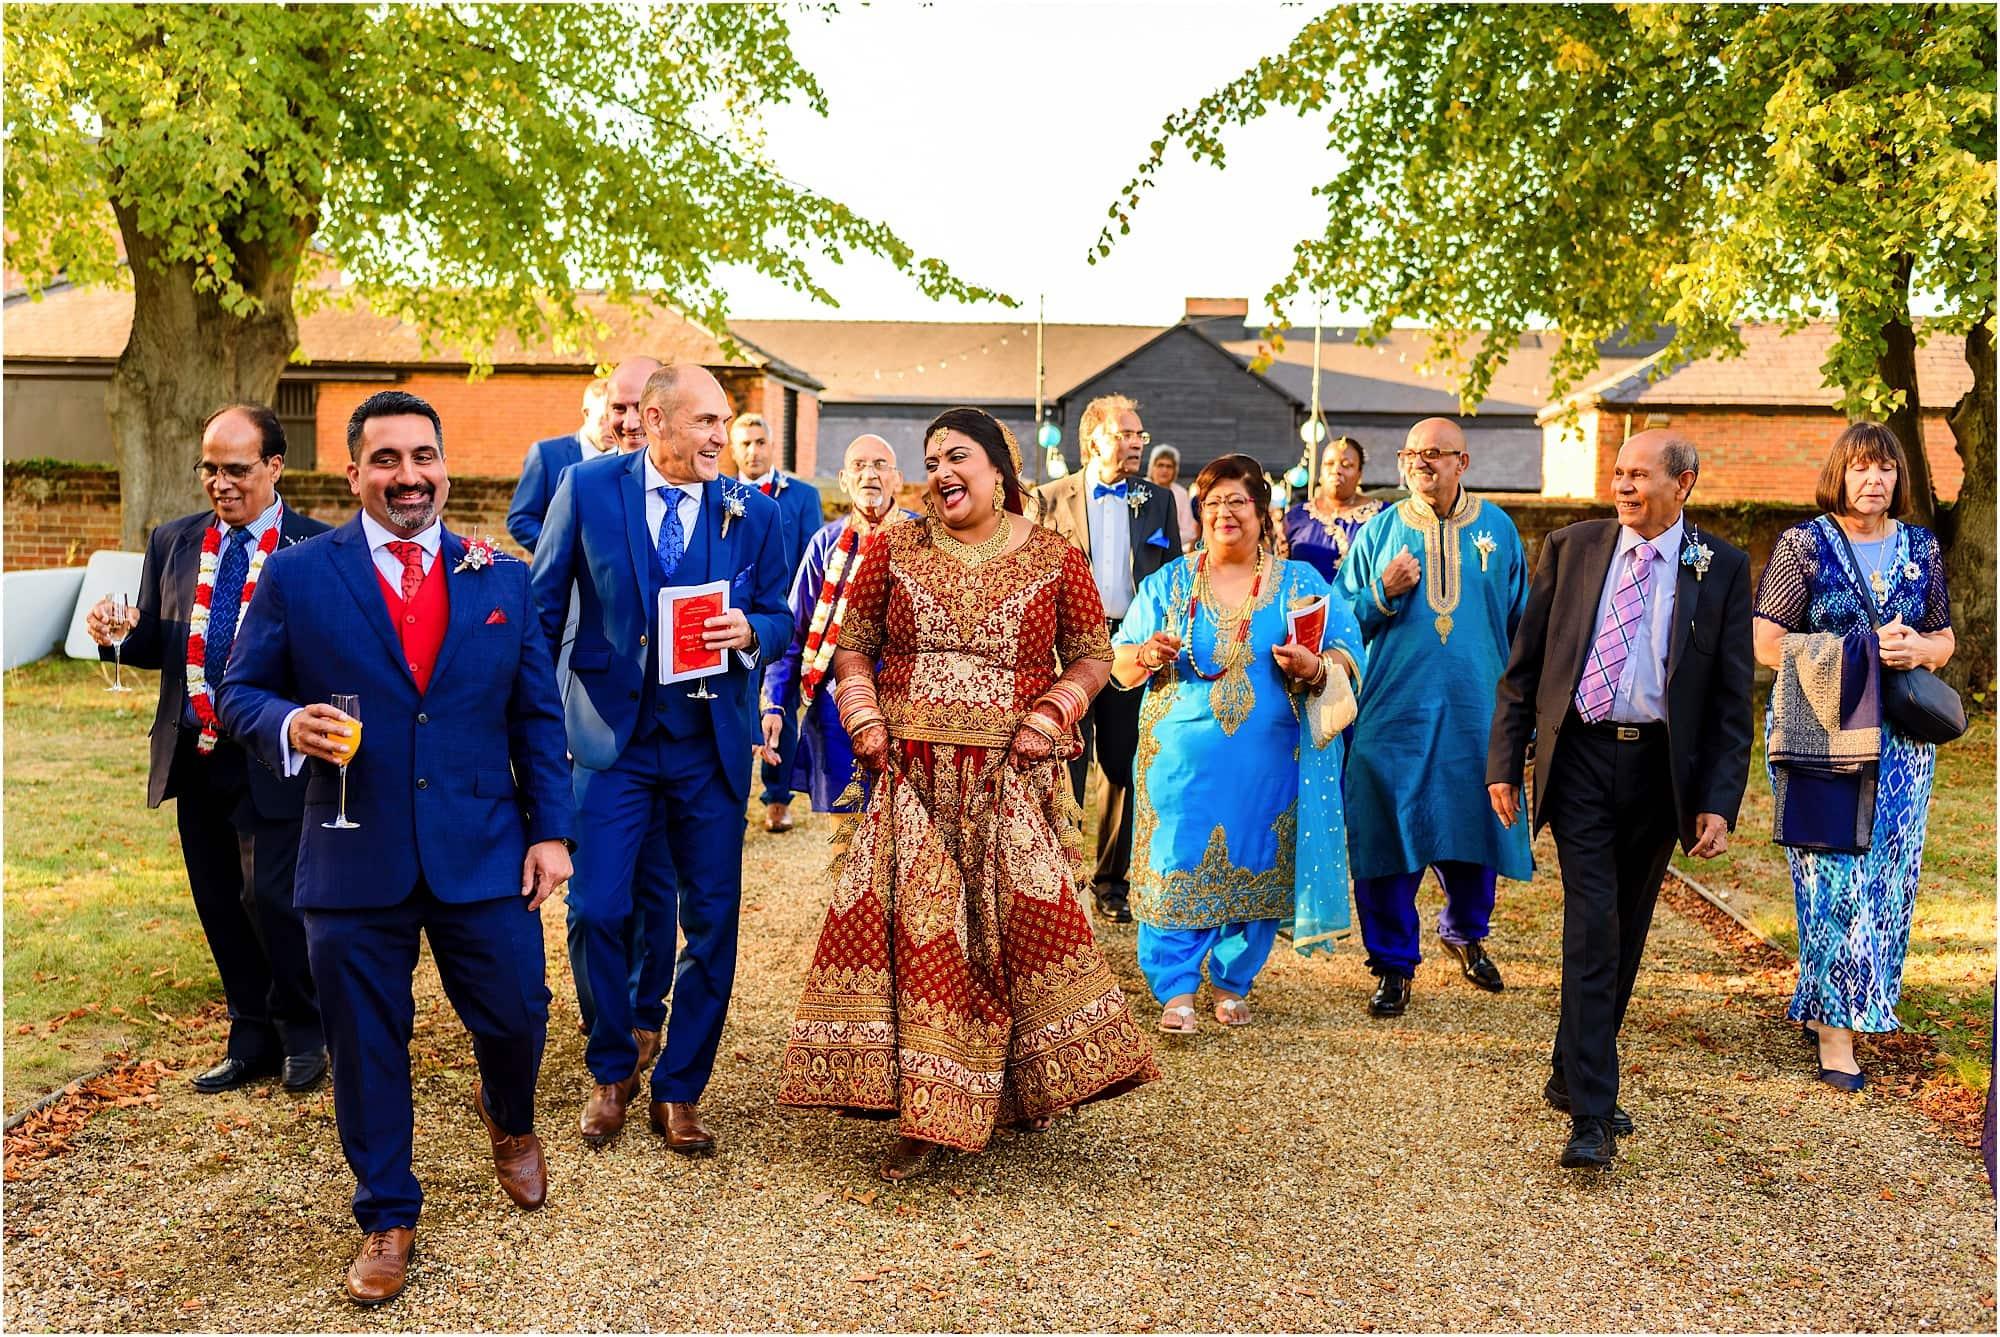 Candid walking shot of wedding party